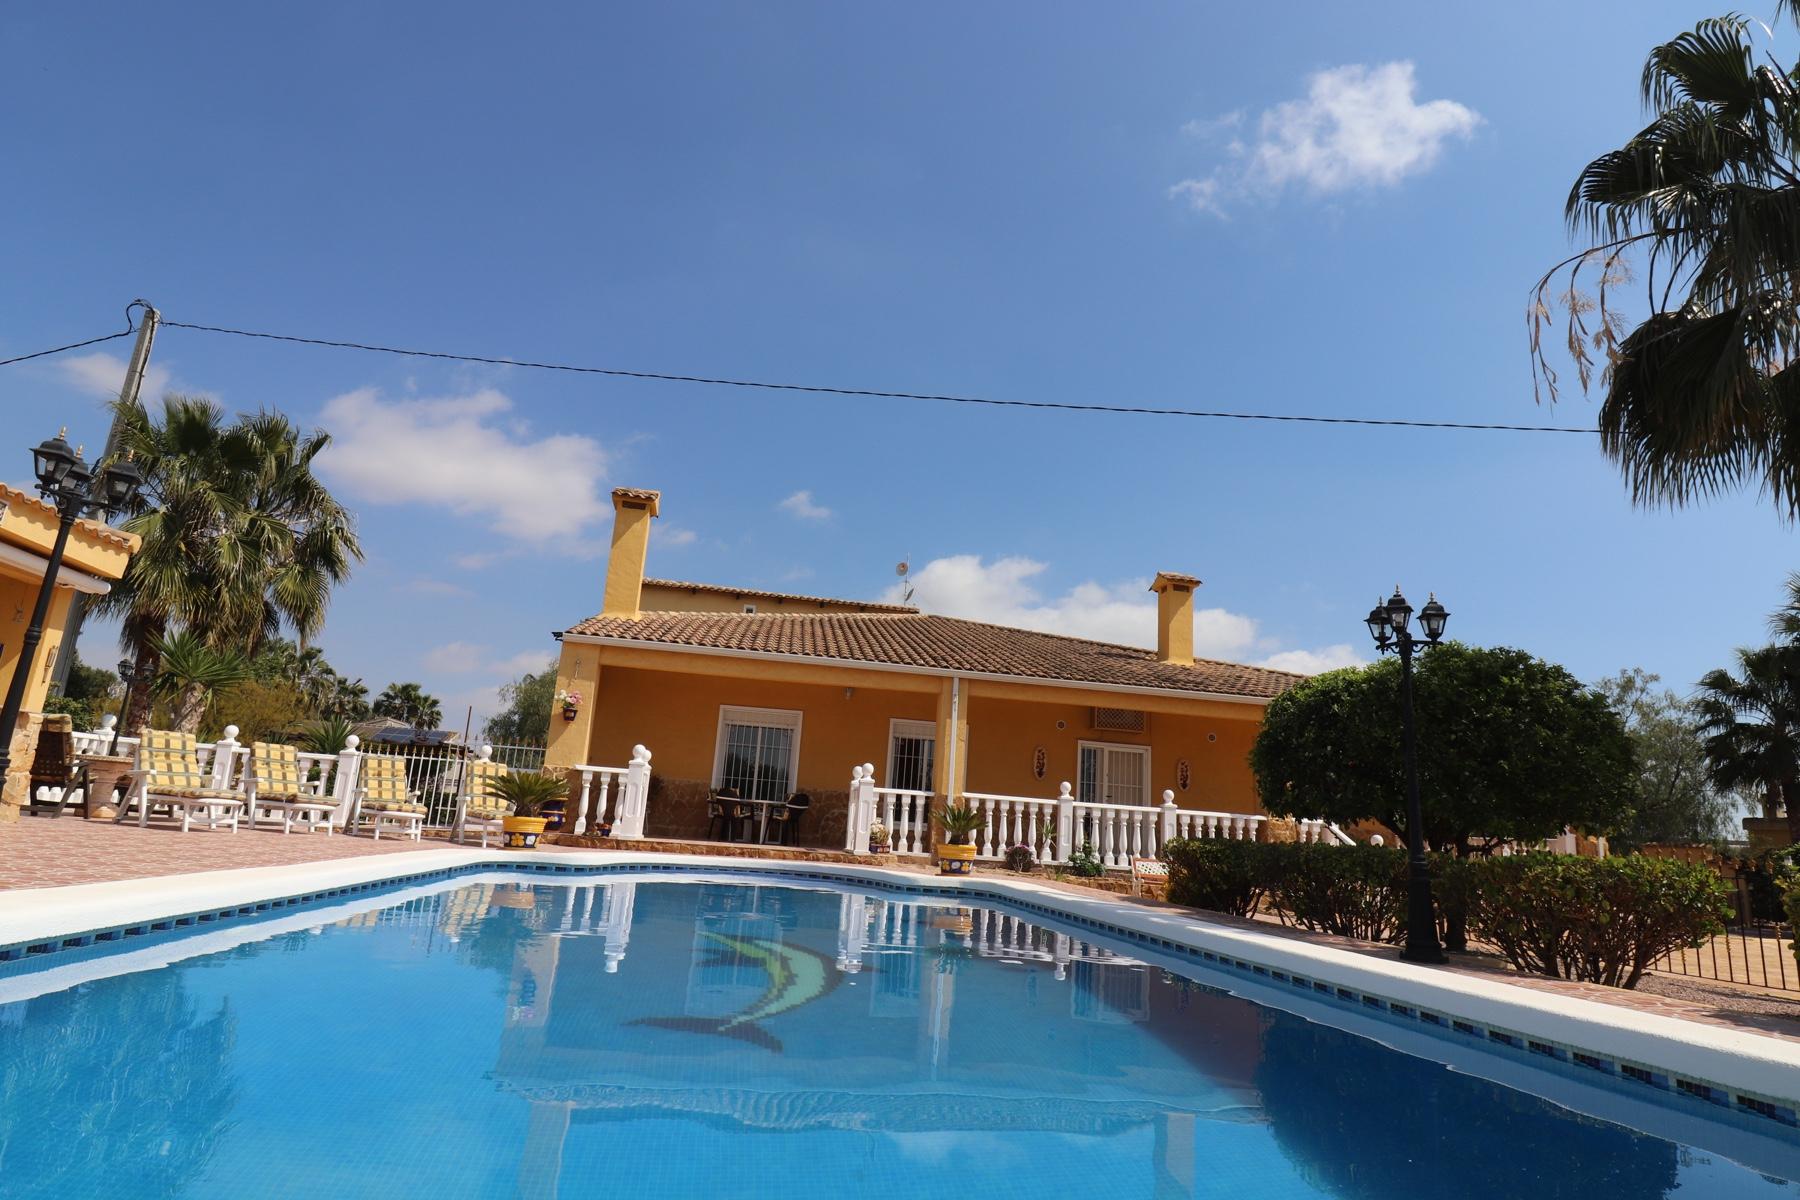 5 bedroom finca for sale in Crevillente, Costa Blanca